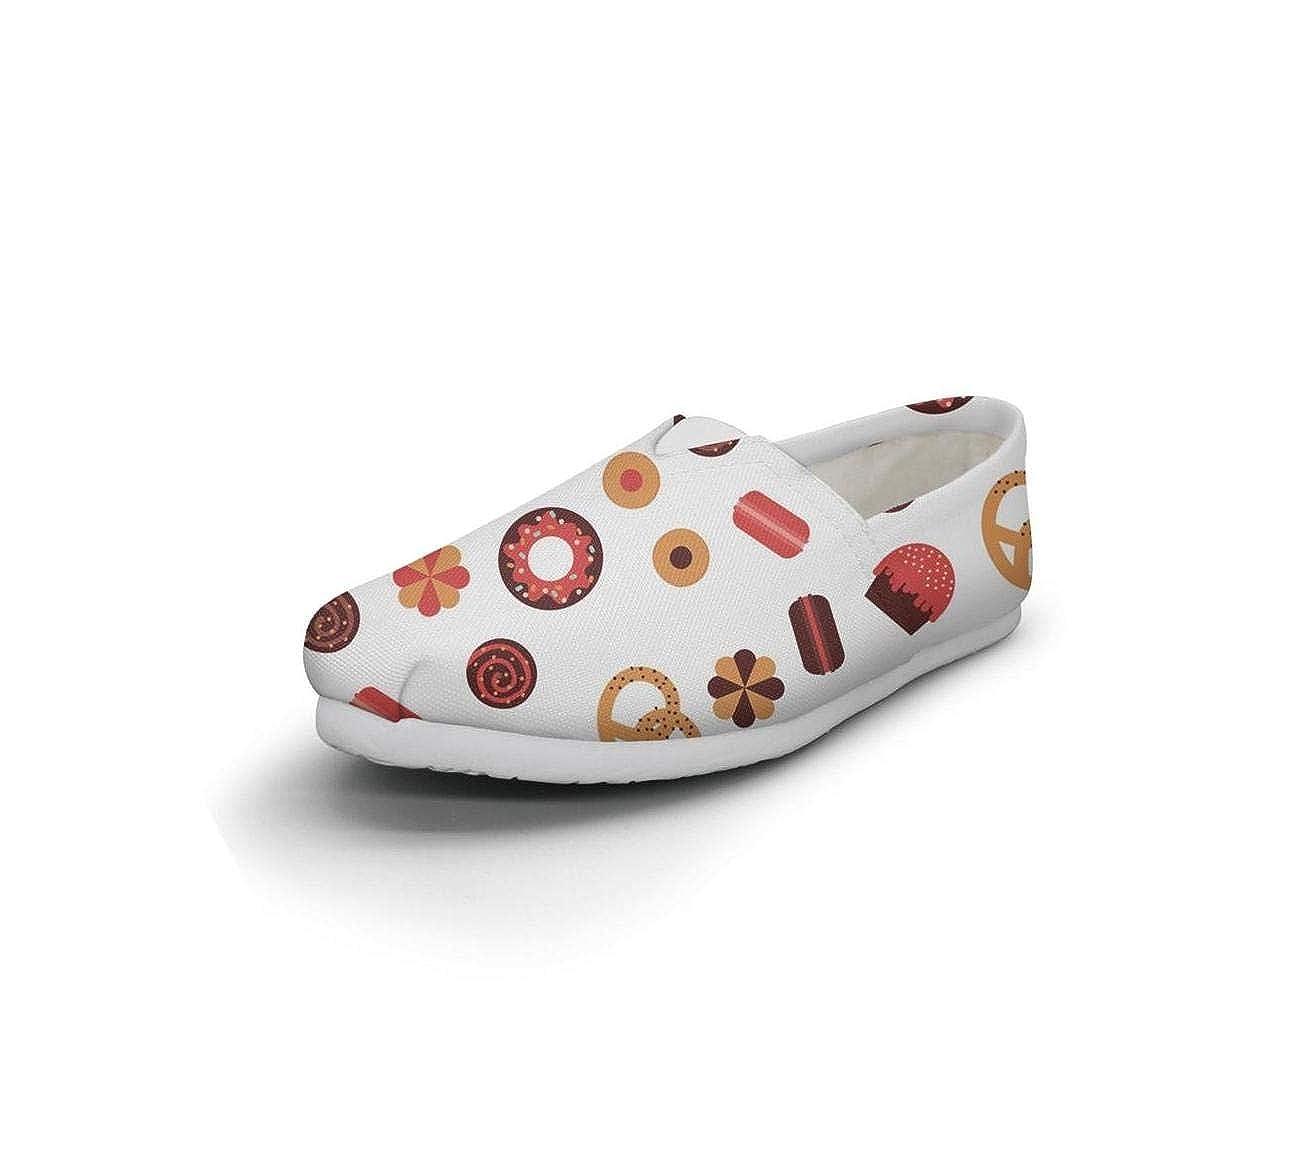 nkfbx Pretzel AMD Coffee Bean Casual Flat Canva Shoes for Girls Exercising